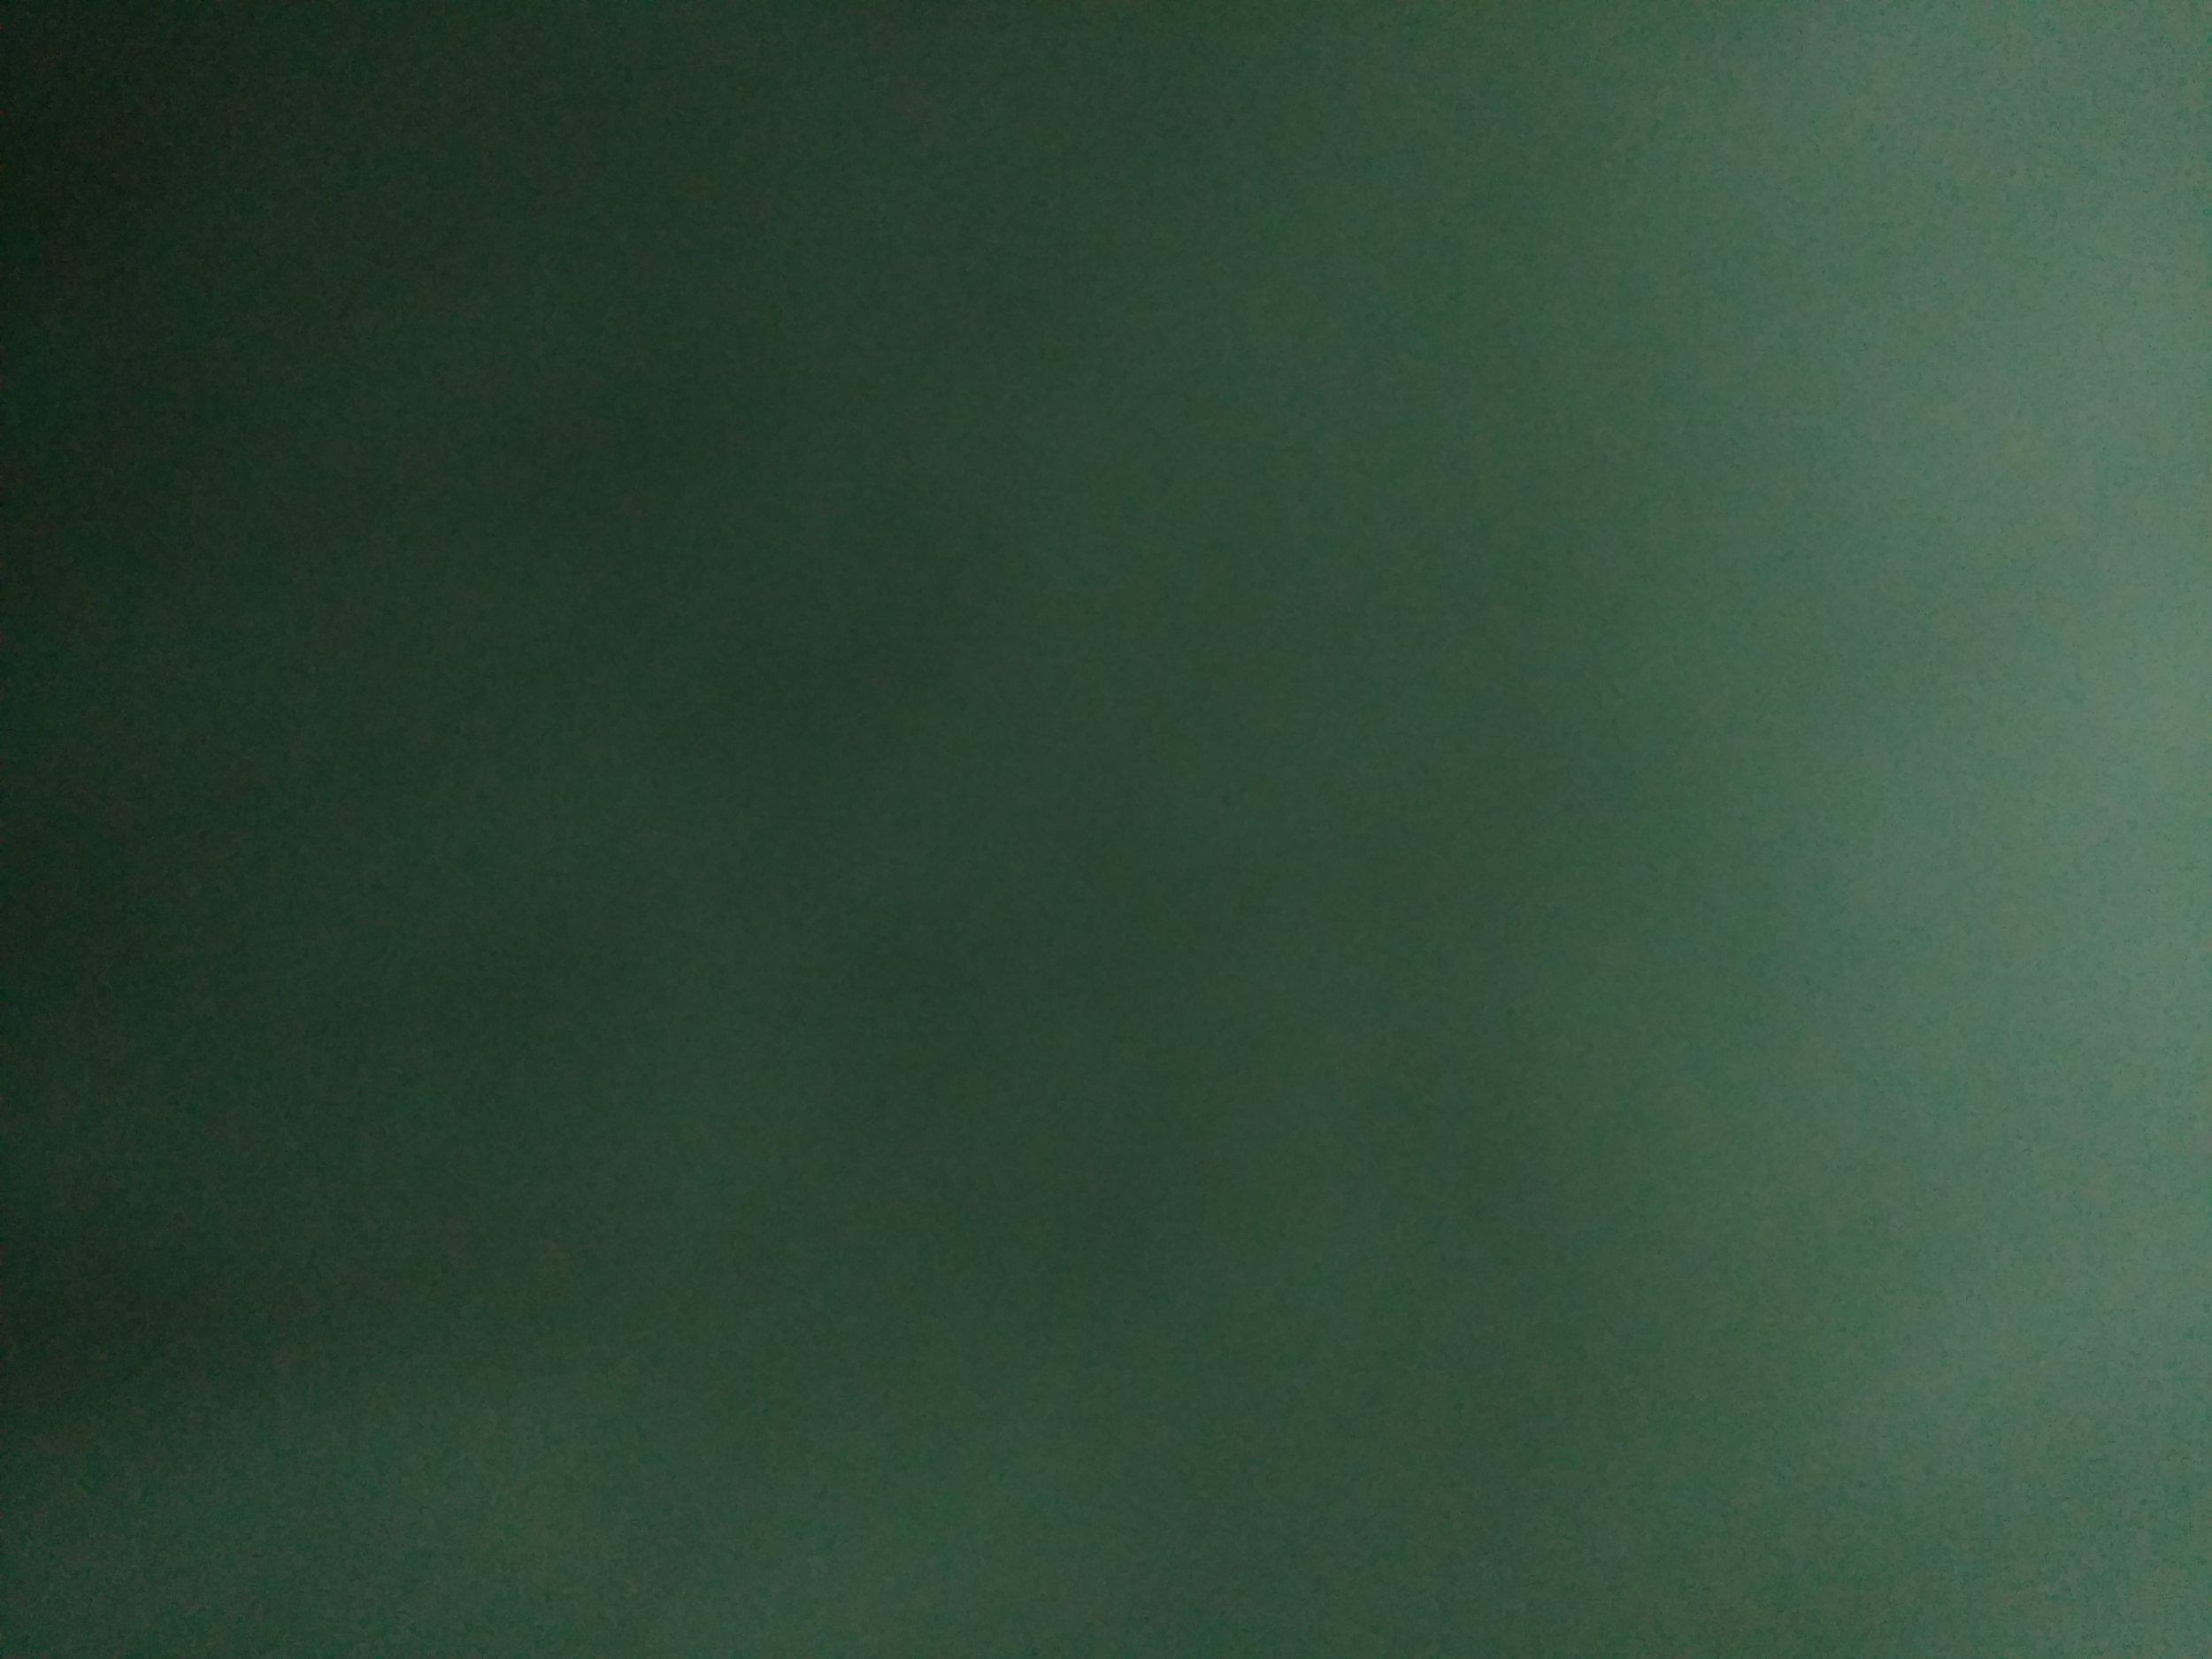 willroth-co-free-texture-gradient-037.jpg